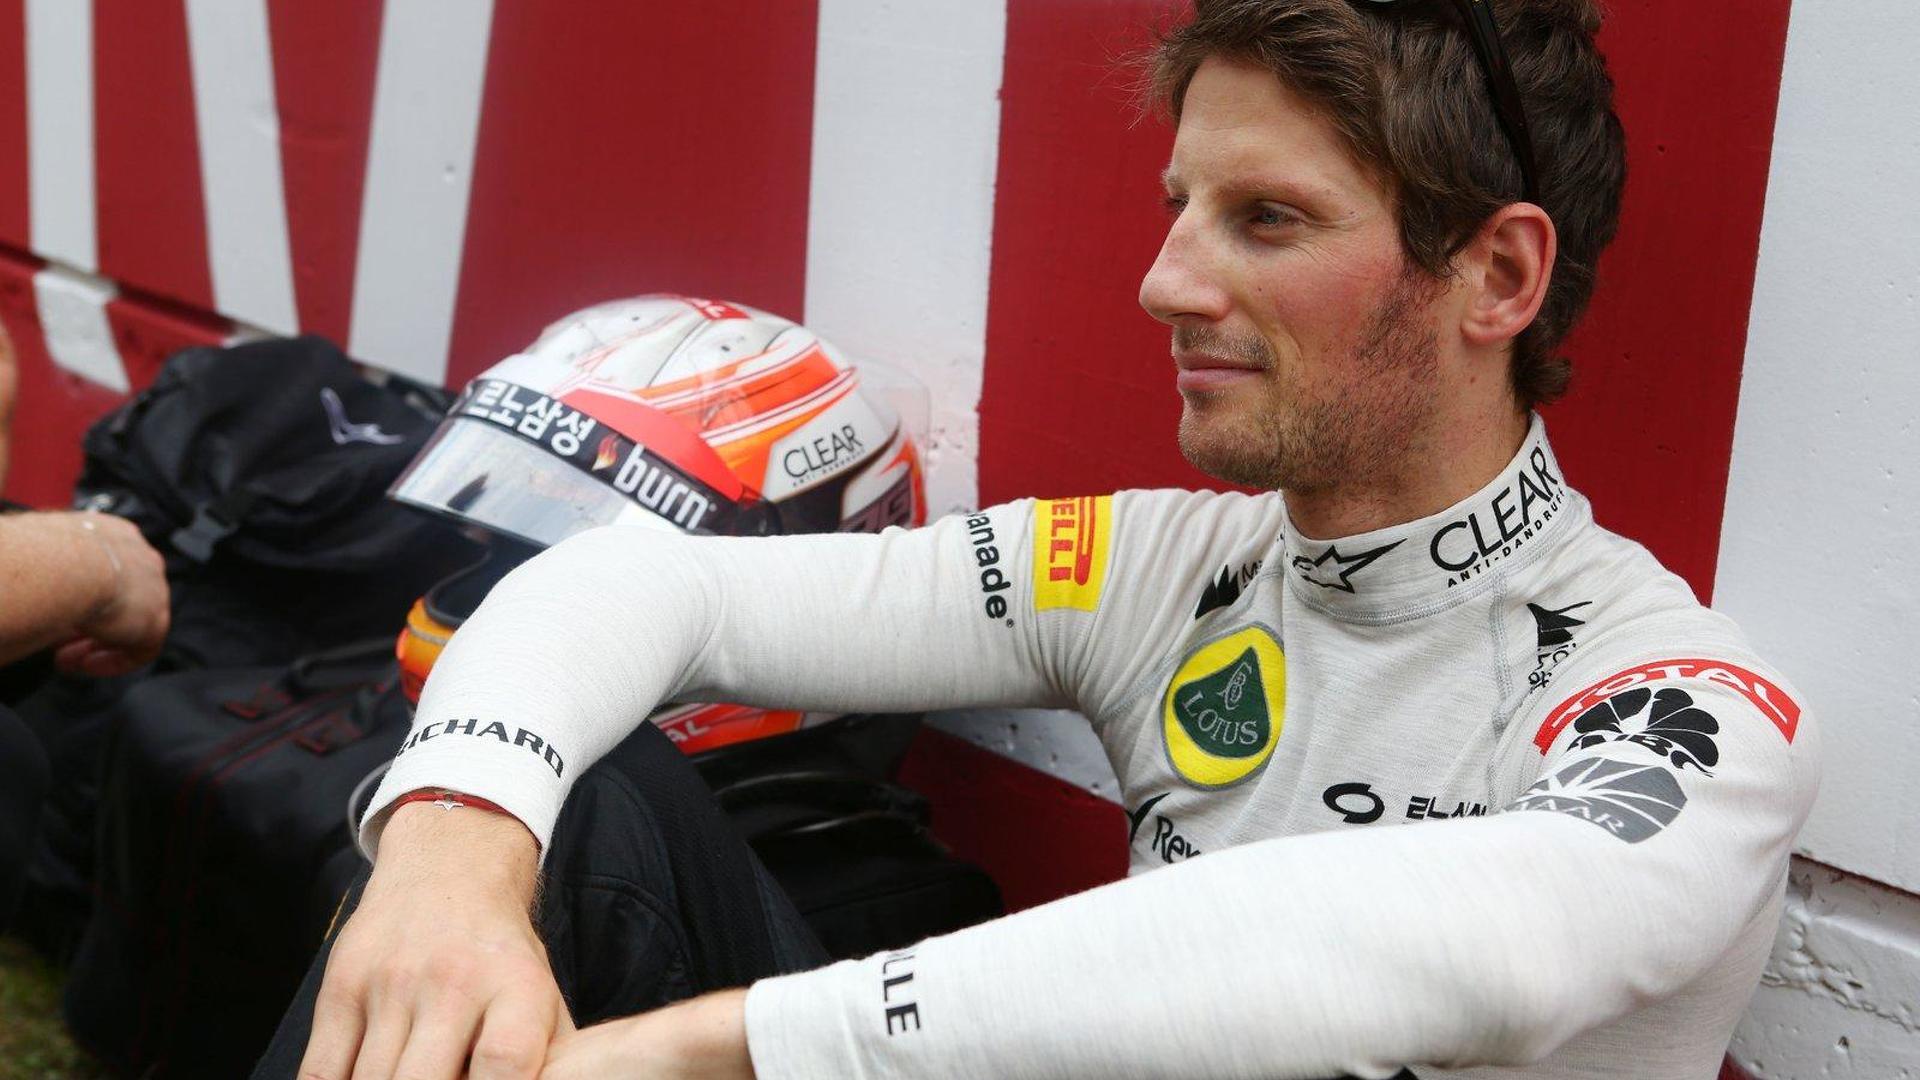 Lotus needs more staff - Grosjean